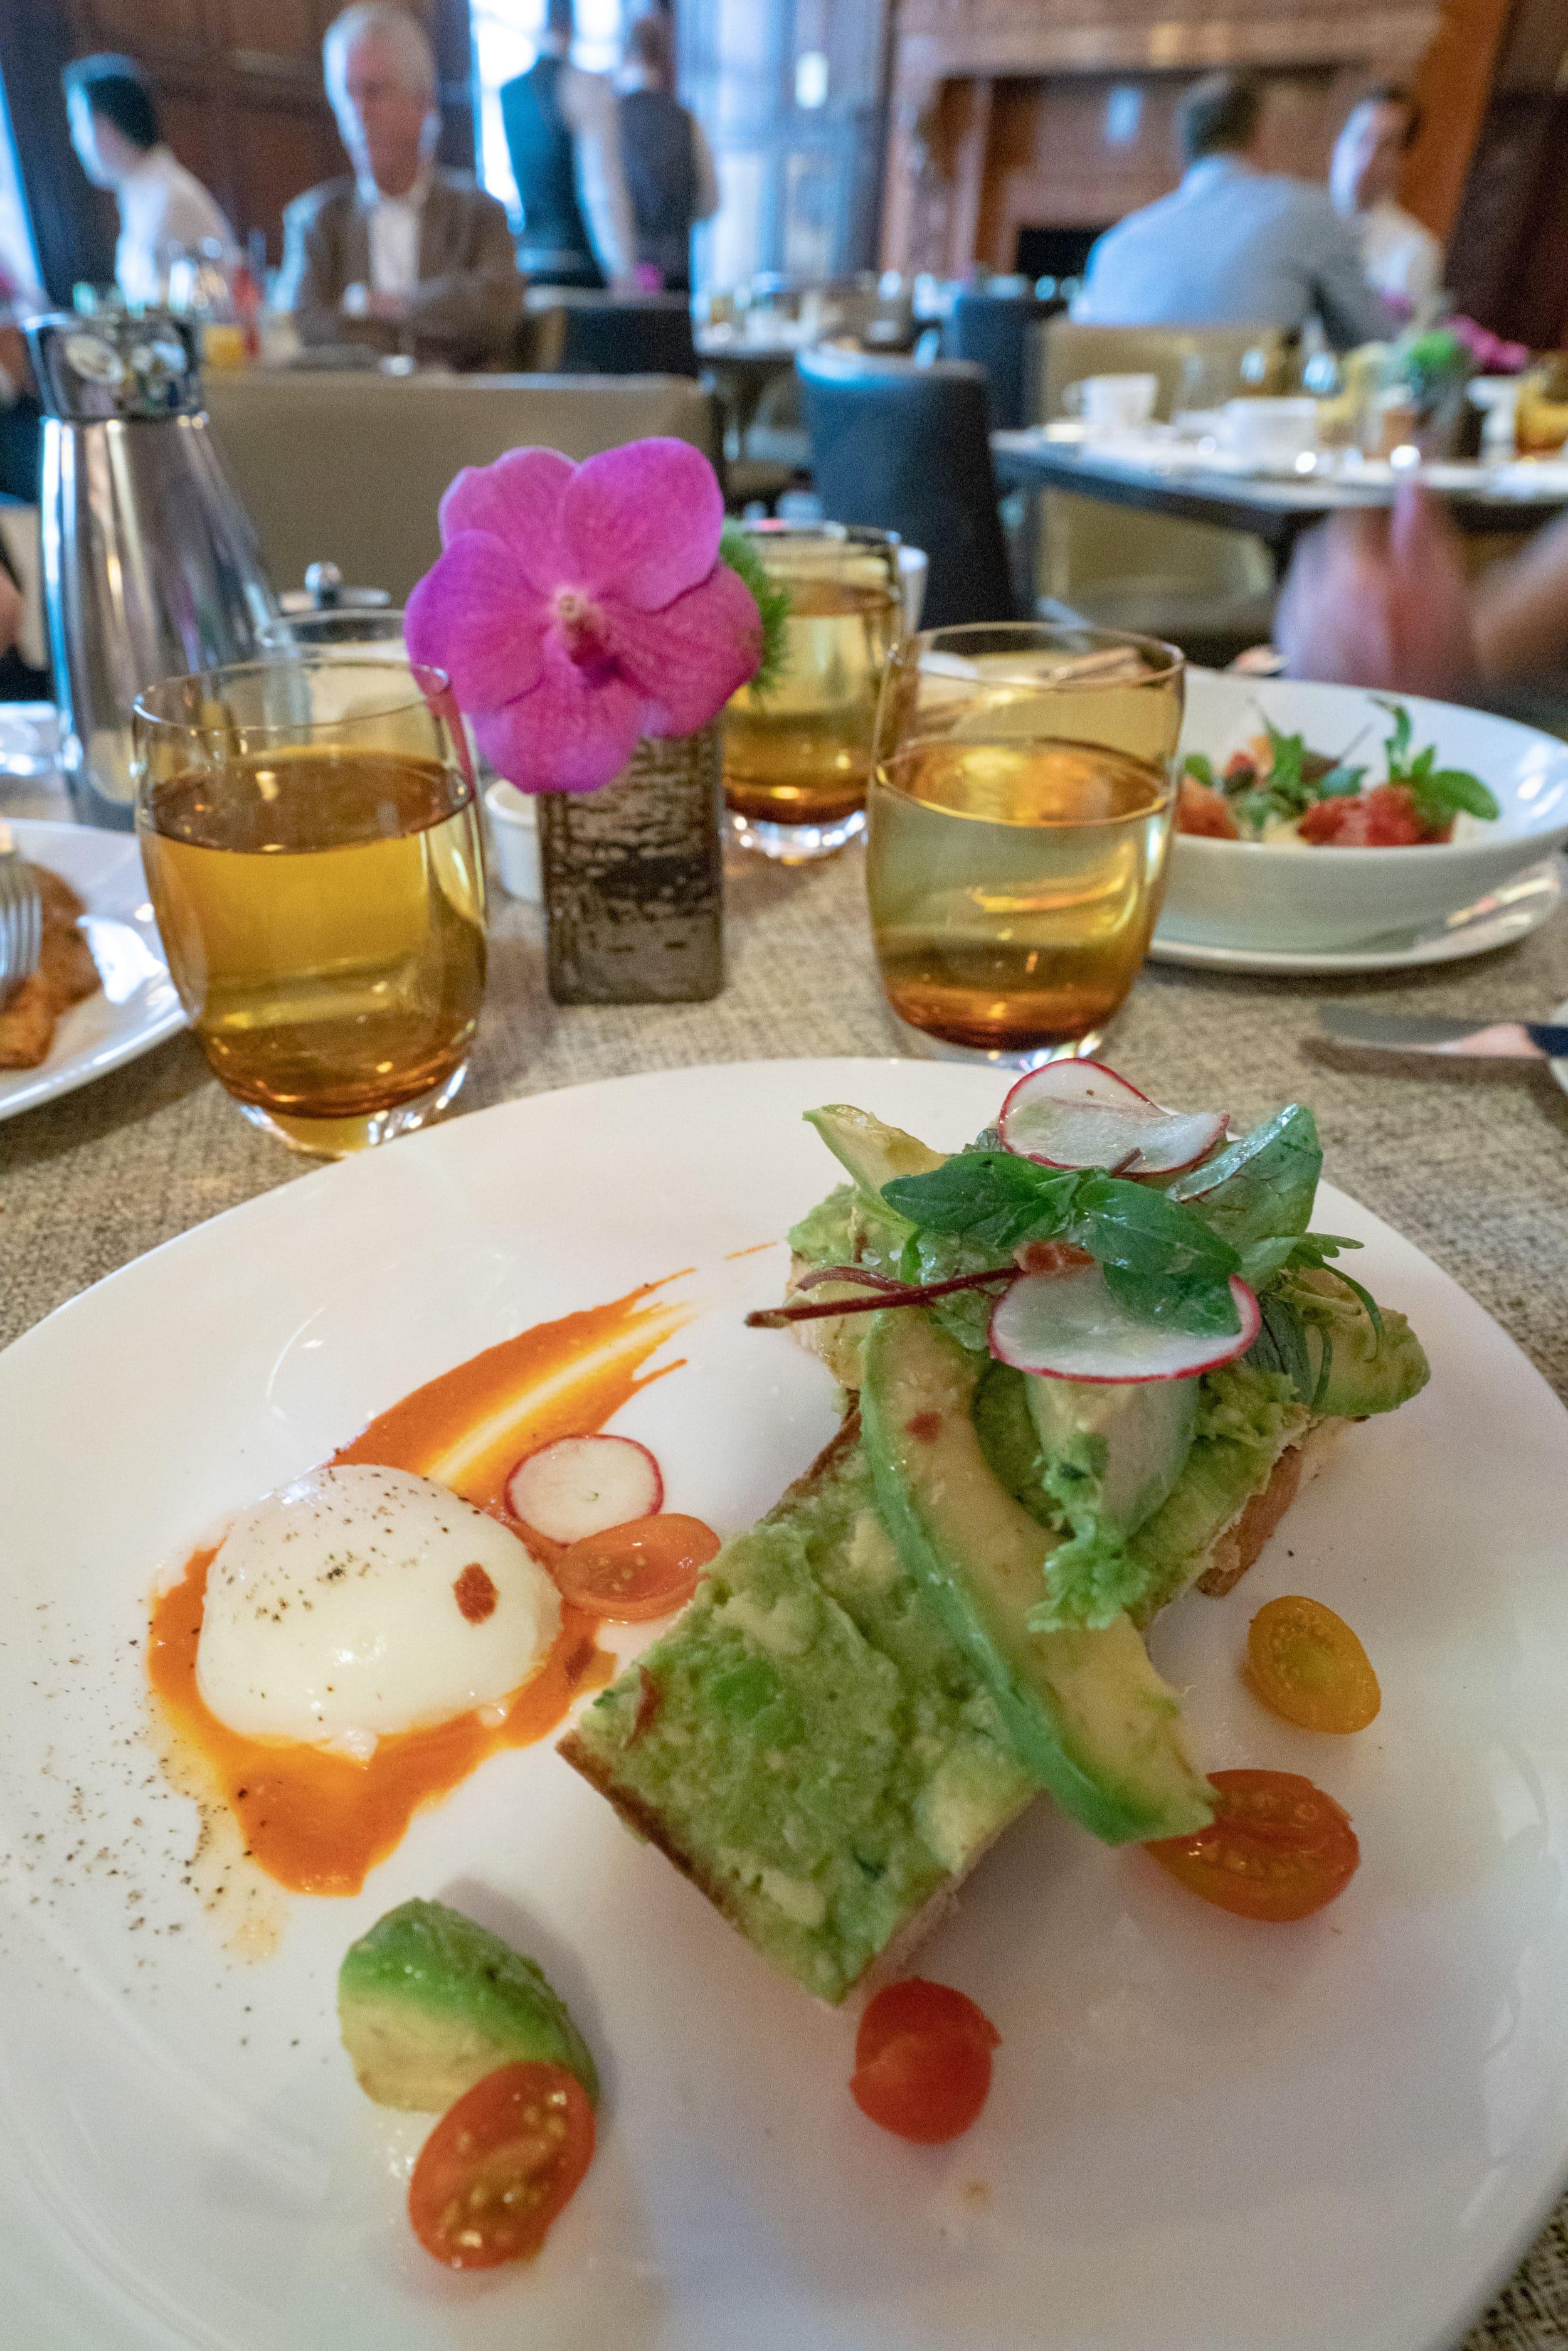 A delicious avocado toast at Villard Restaurant inside Lotte New York Palace